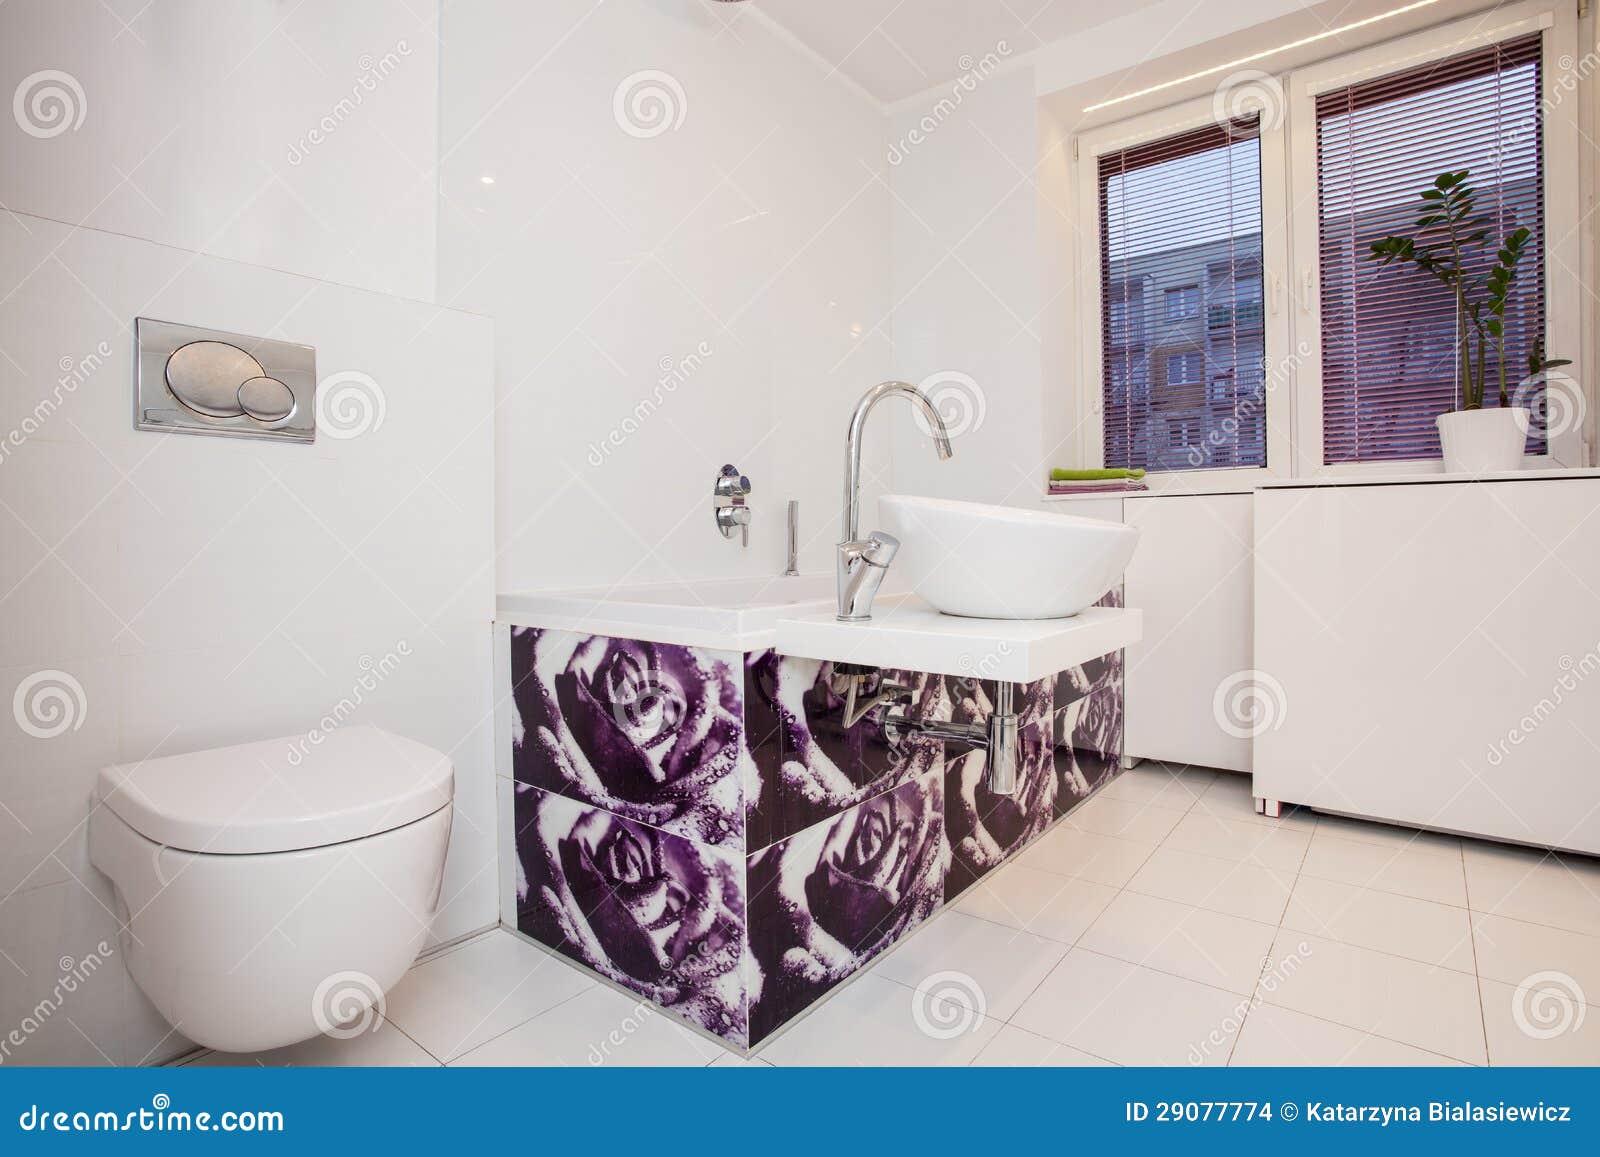 Cuarto De Baño Moderno Fotos:Plano Elegante – Cuarto De Baño Moderno Imagenes de archivo – Imagen